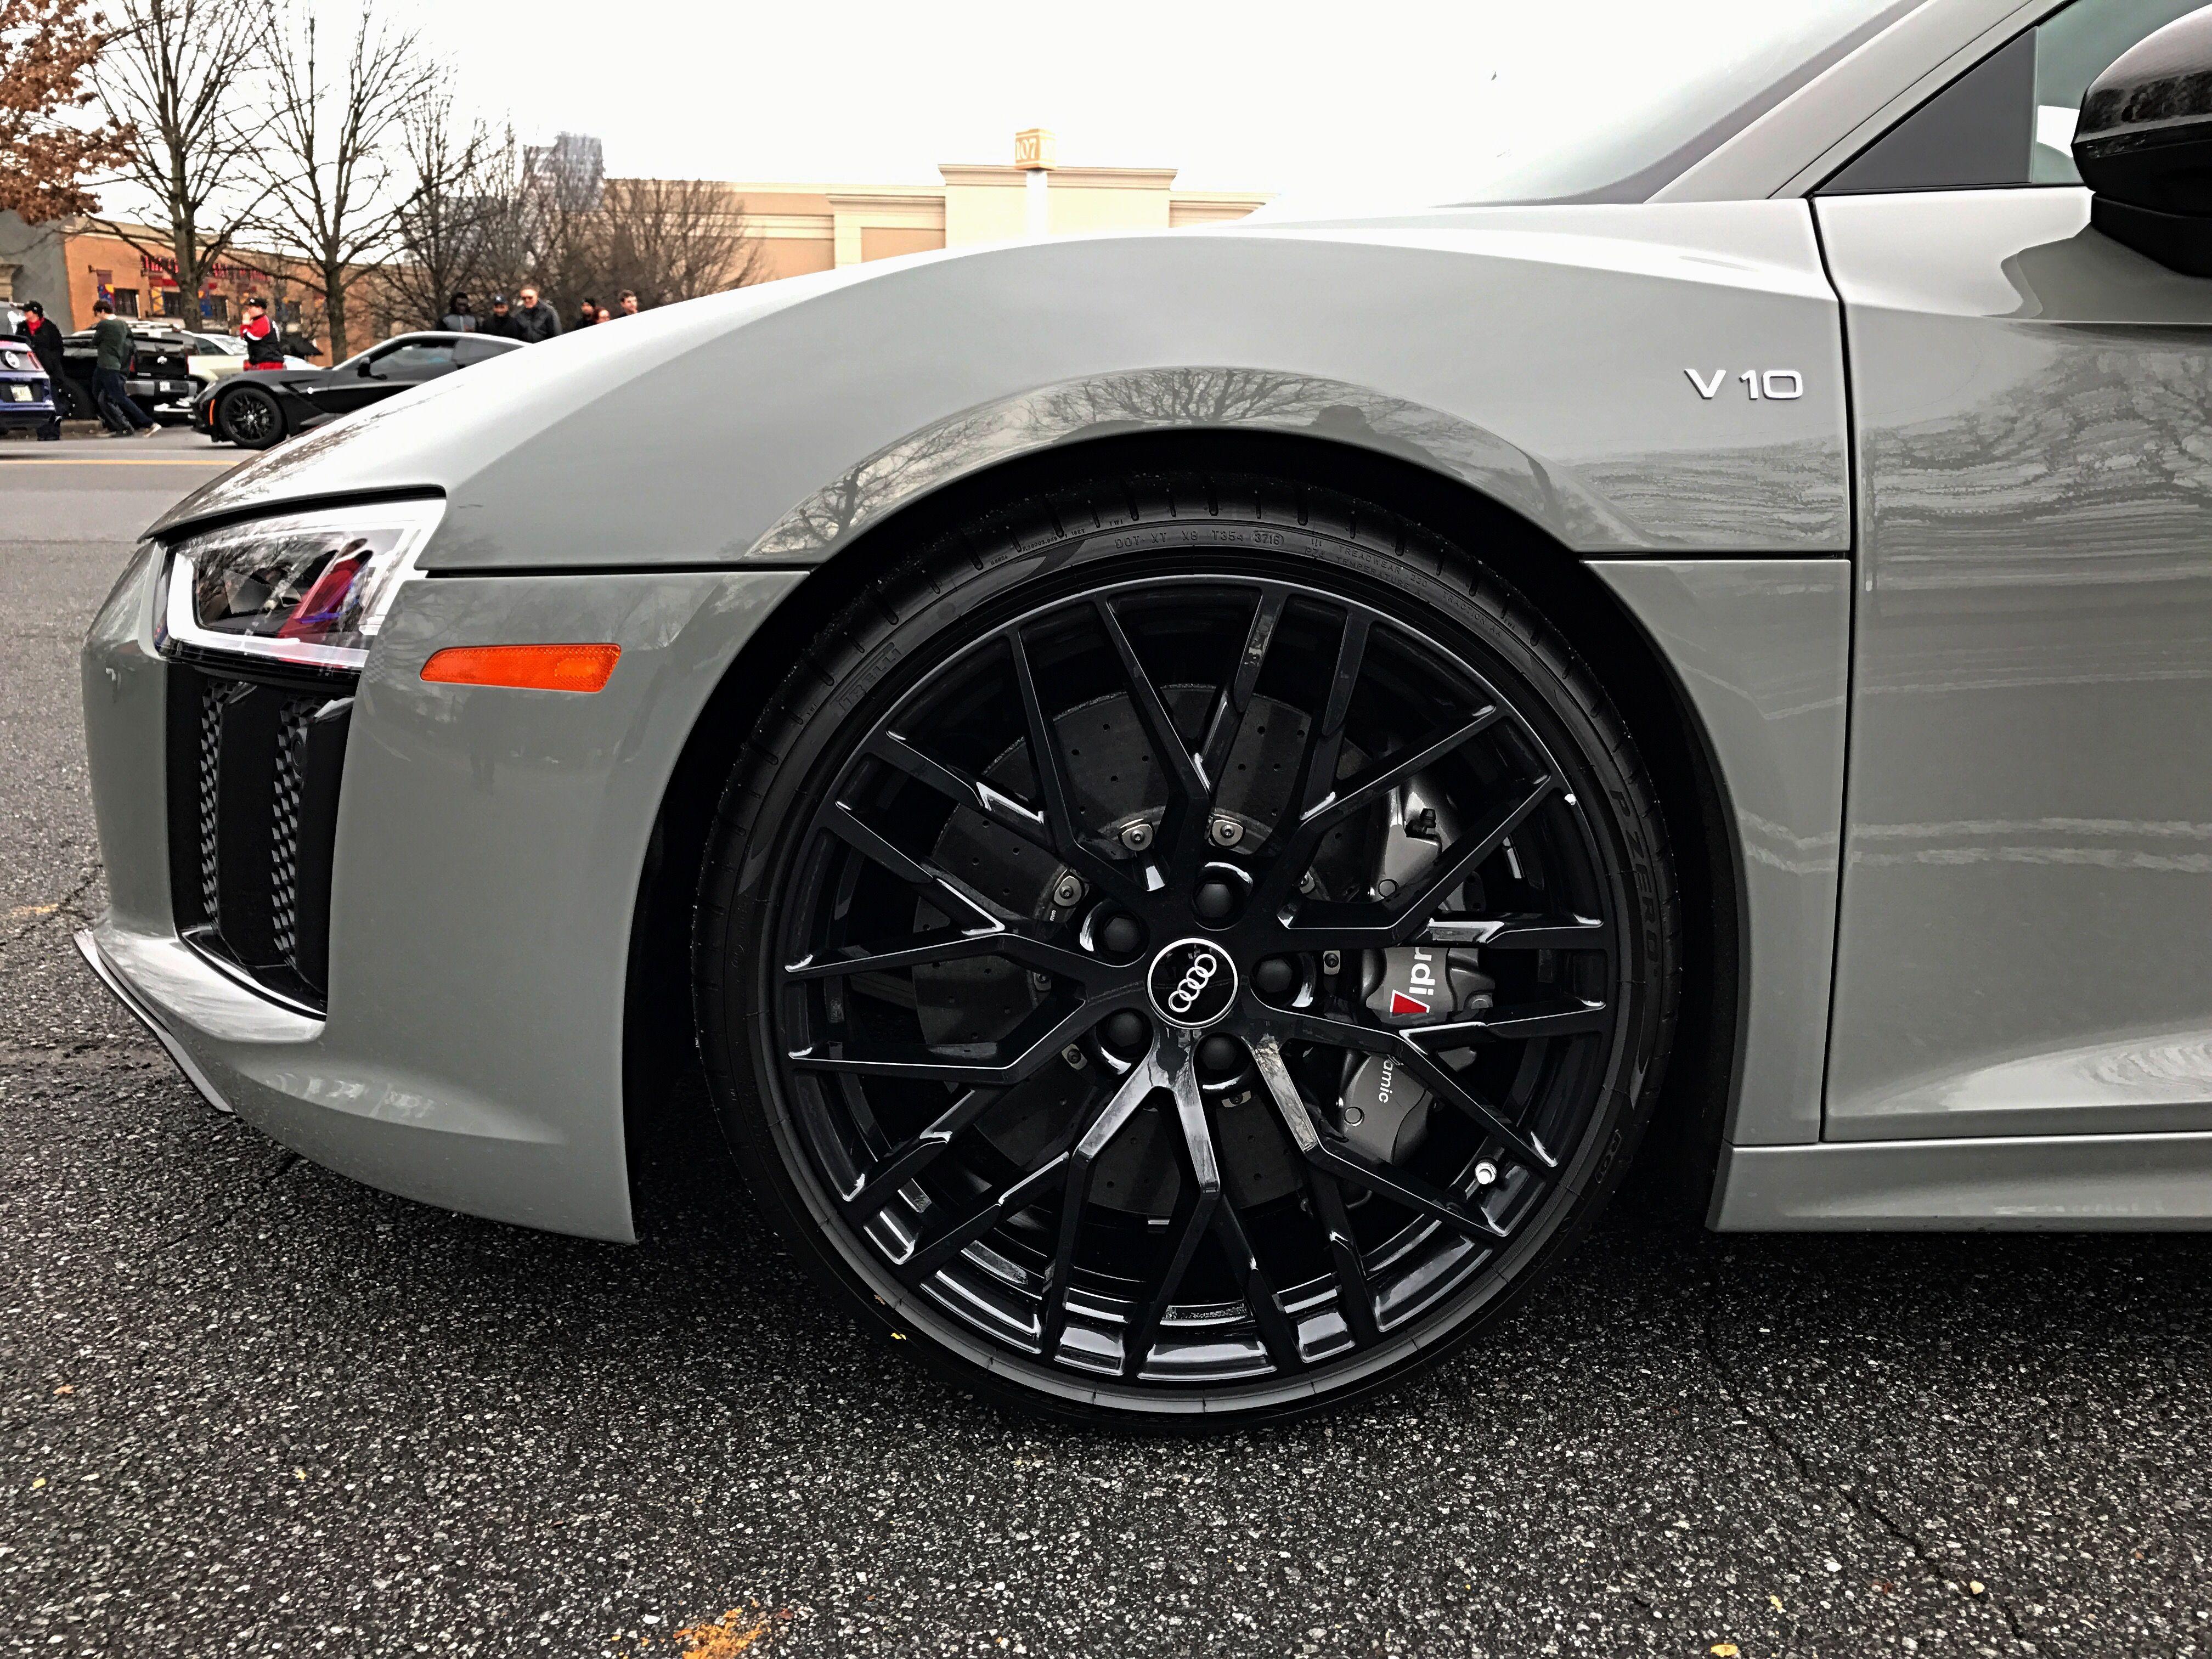 1 Of 25 Audi R8 V10 Plus Quantum Edition Audi R8 V10 Plus Audi R8 V10 R8 V10 Plus